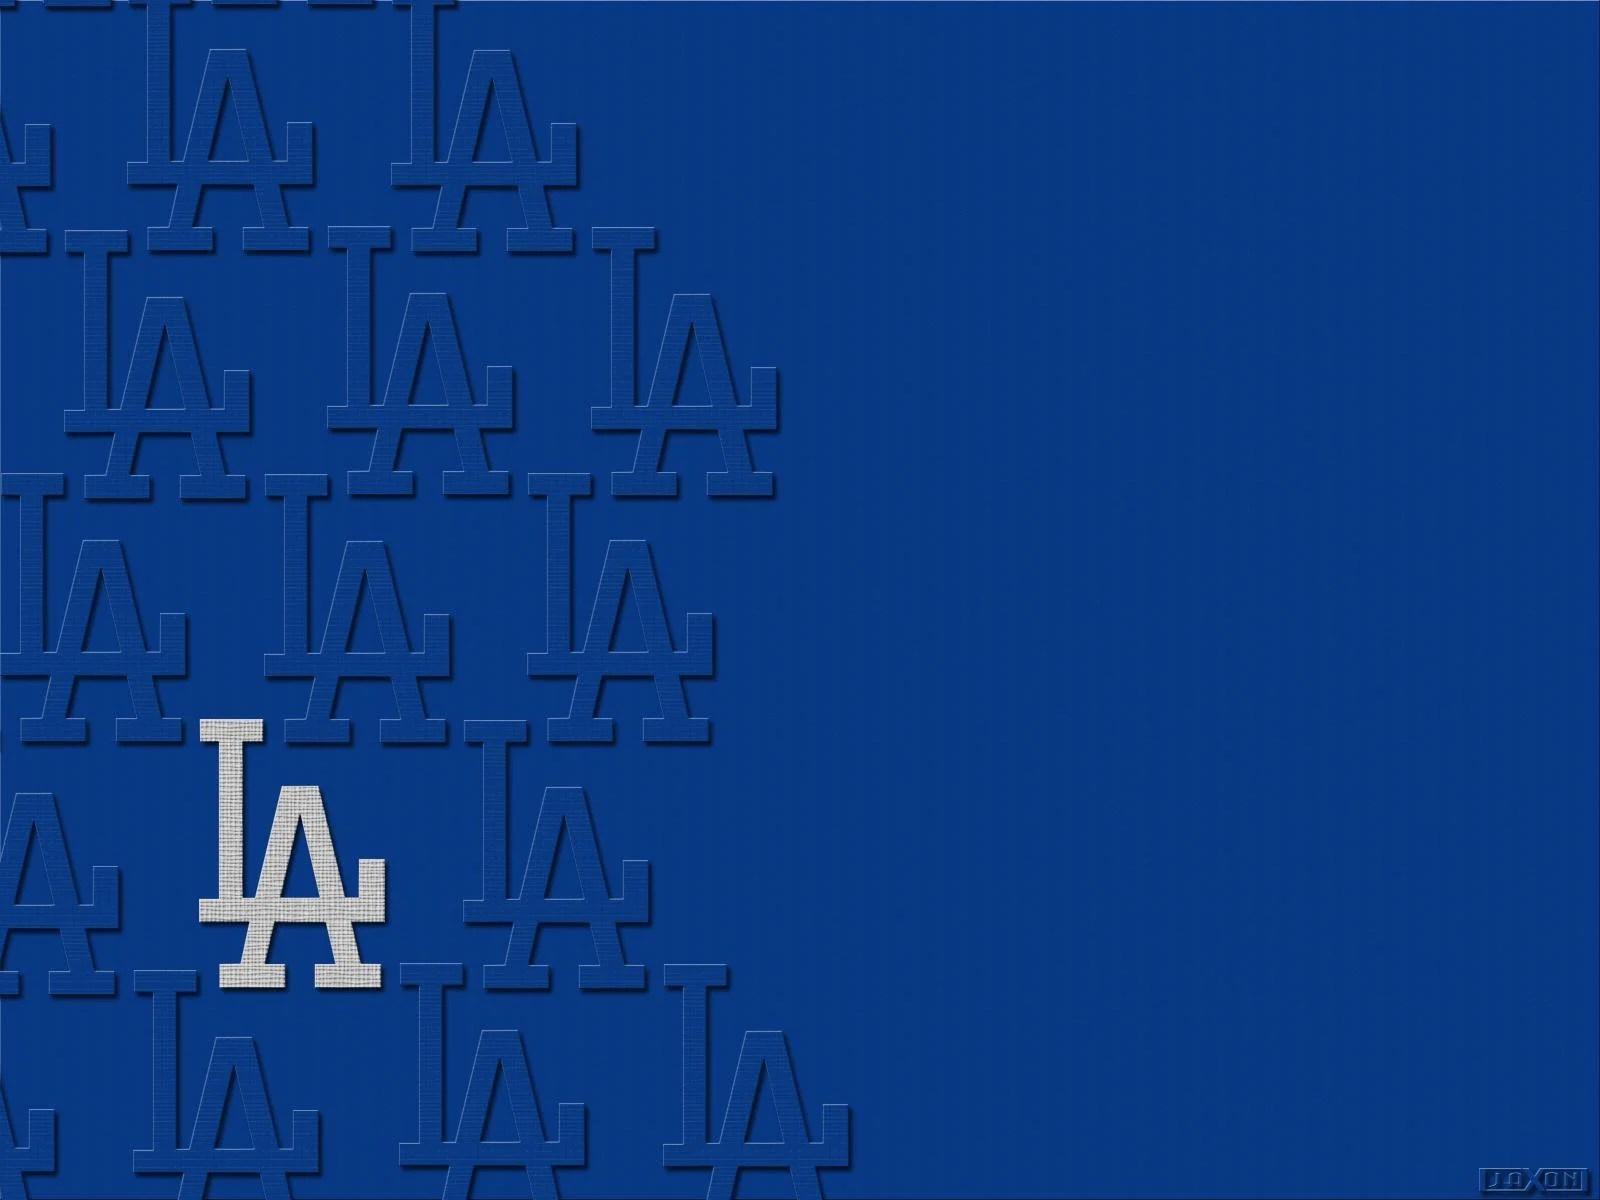 Beisbol Wallpaper 3d Los Angeles Dodgers Wallpapers Wallpaper Cave